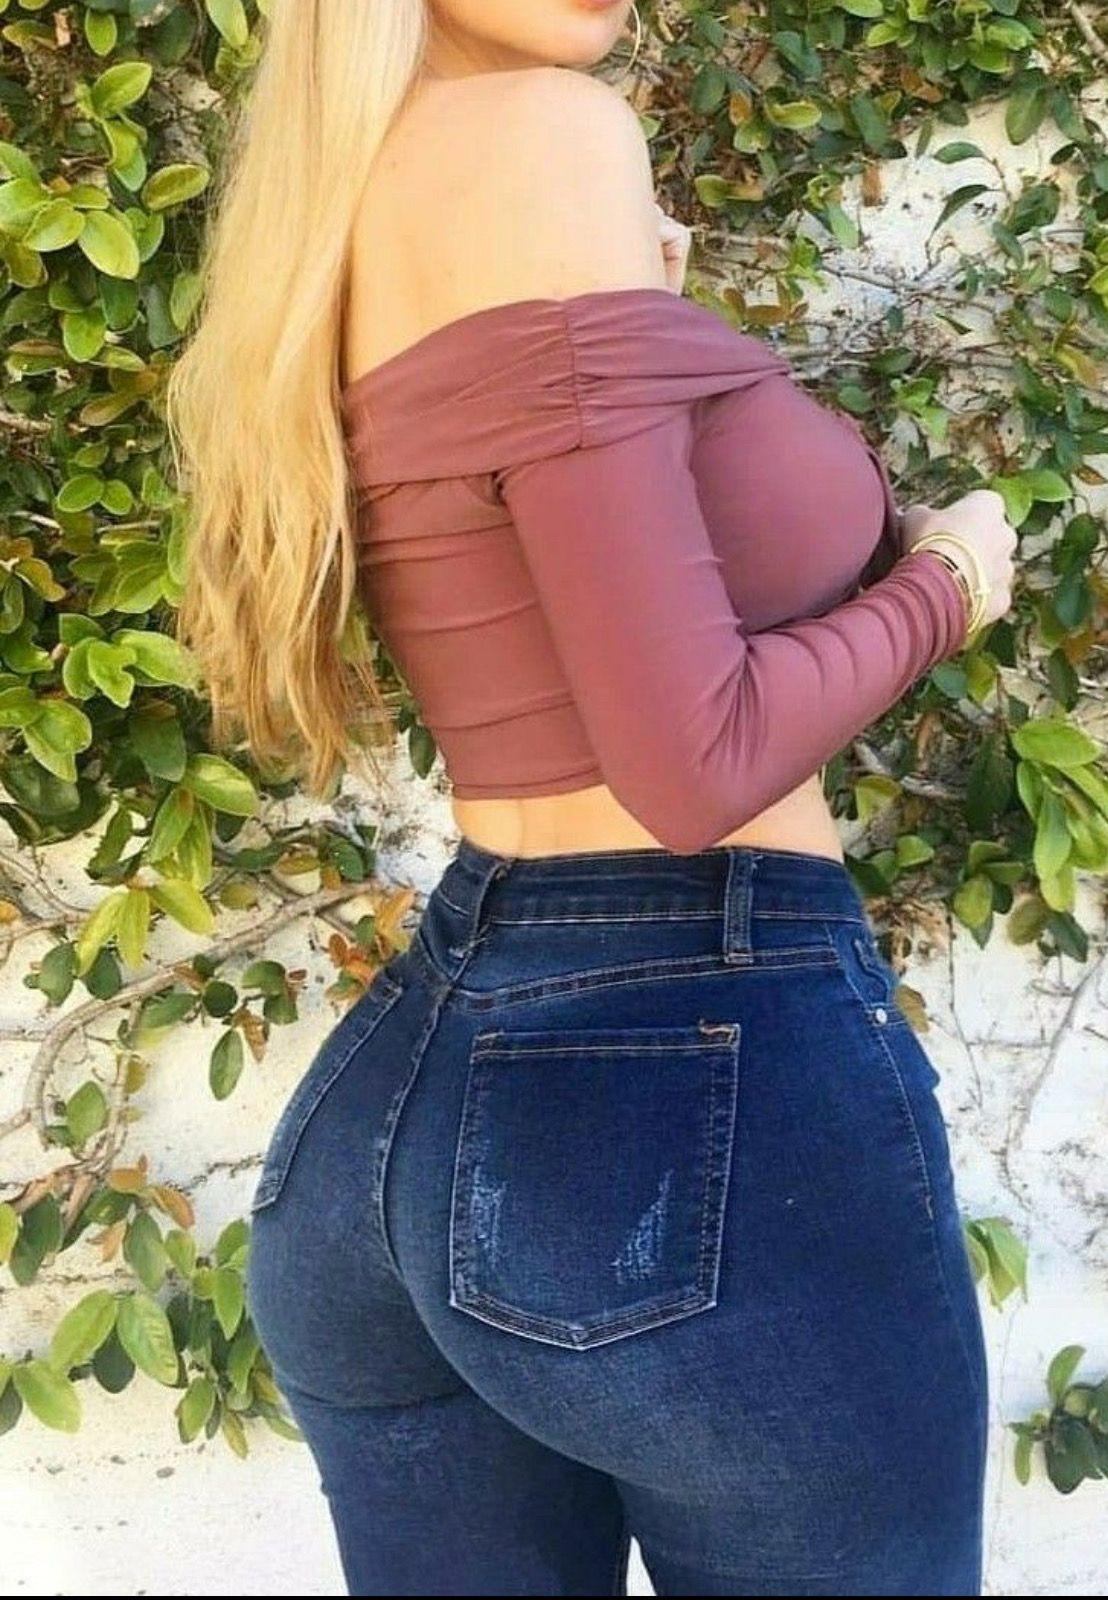 Big booty teen white girls